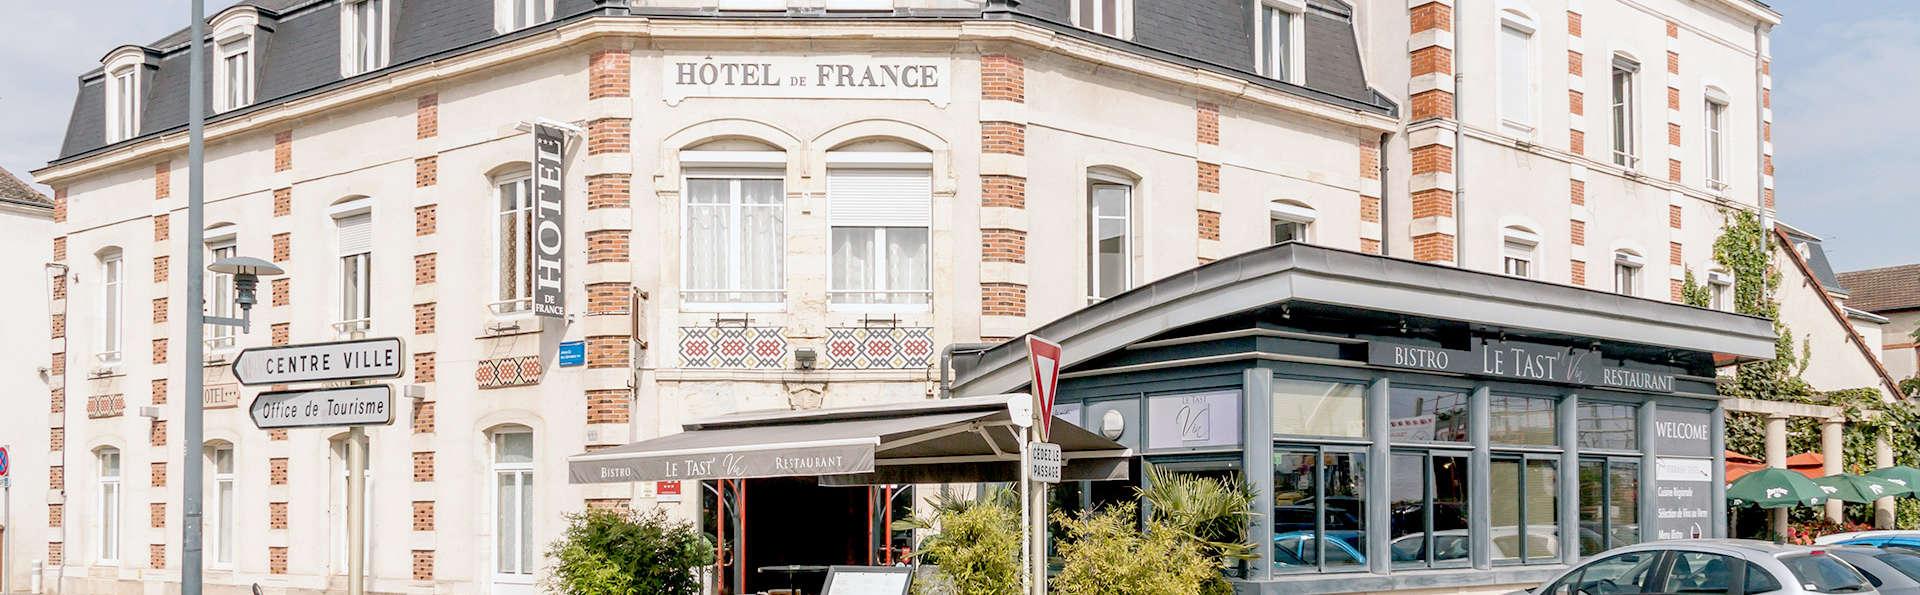 Hôtel de France Restaurant Tast'vin  - Edit_front.jpg